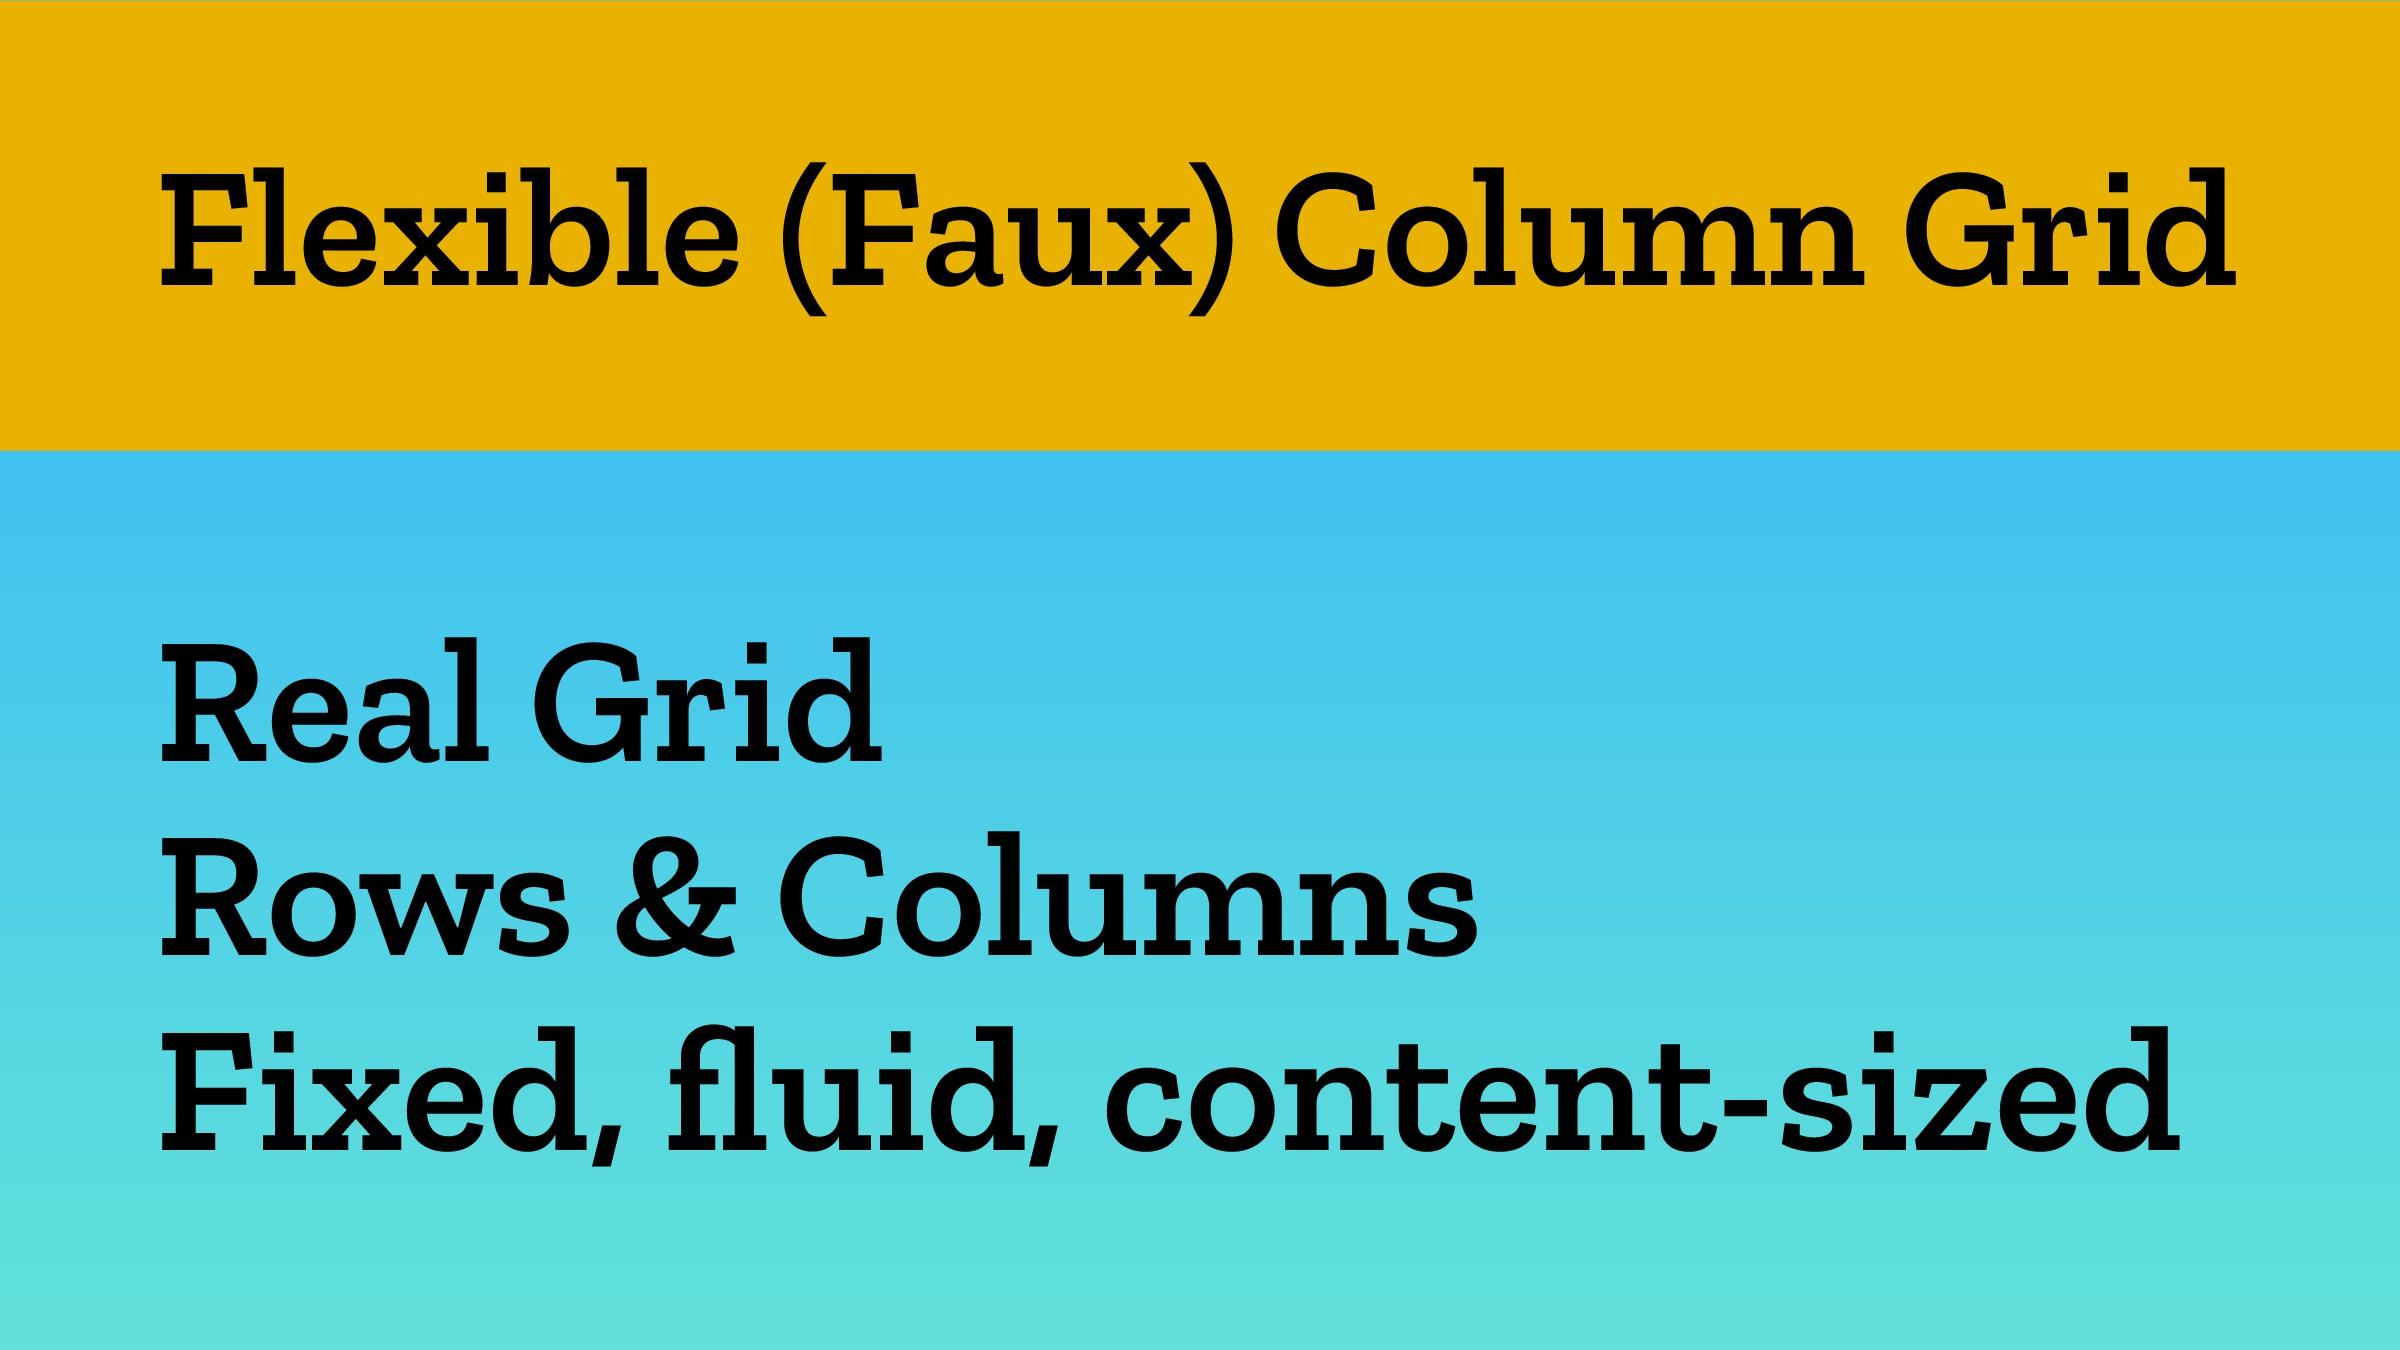 Flexible (Faux) Column Grid Real Grid Rows & Co...